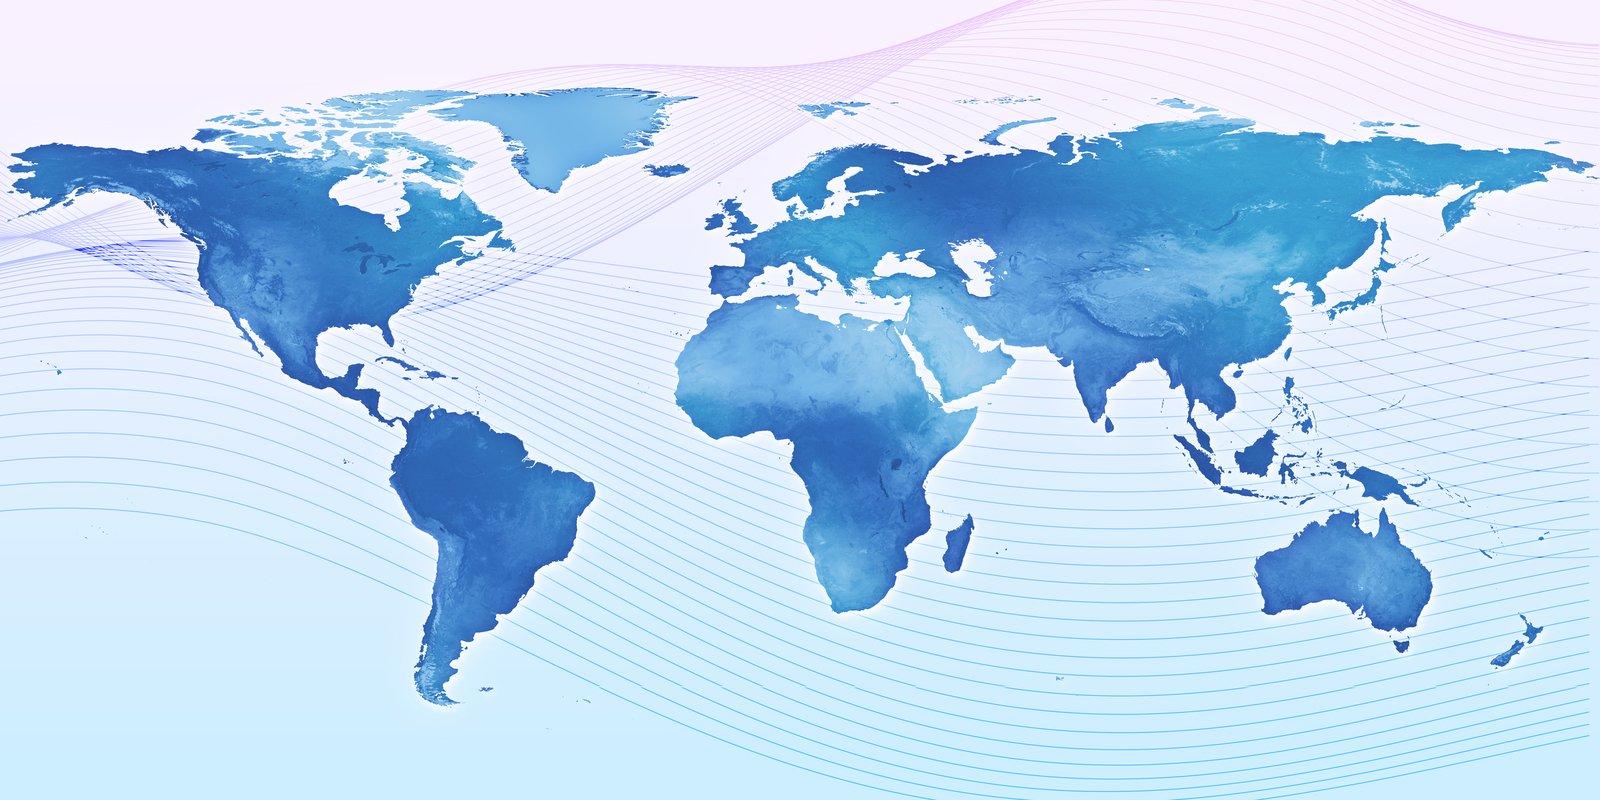 Free Global Karta Stock Photo Freeimages Com